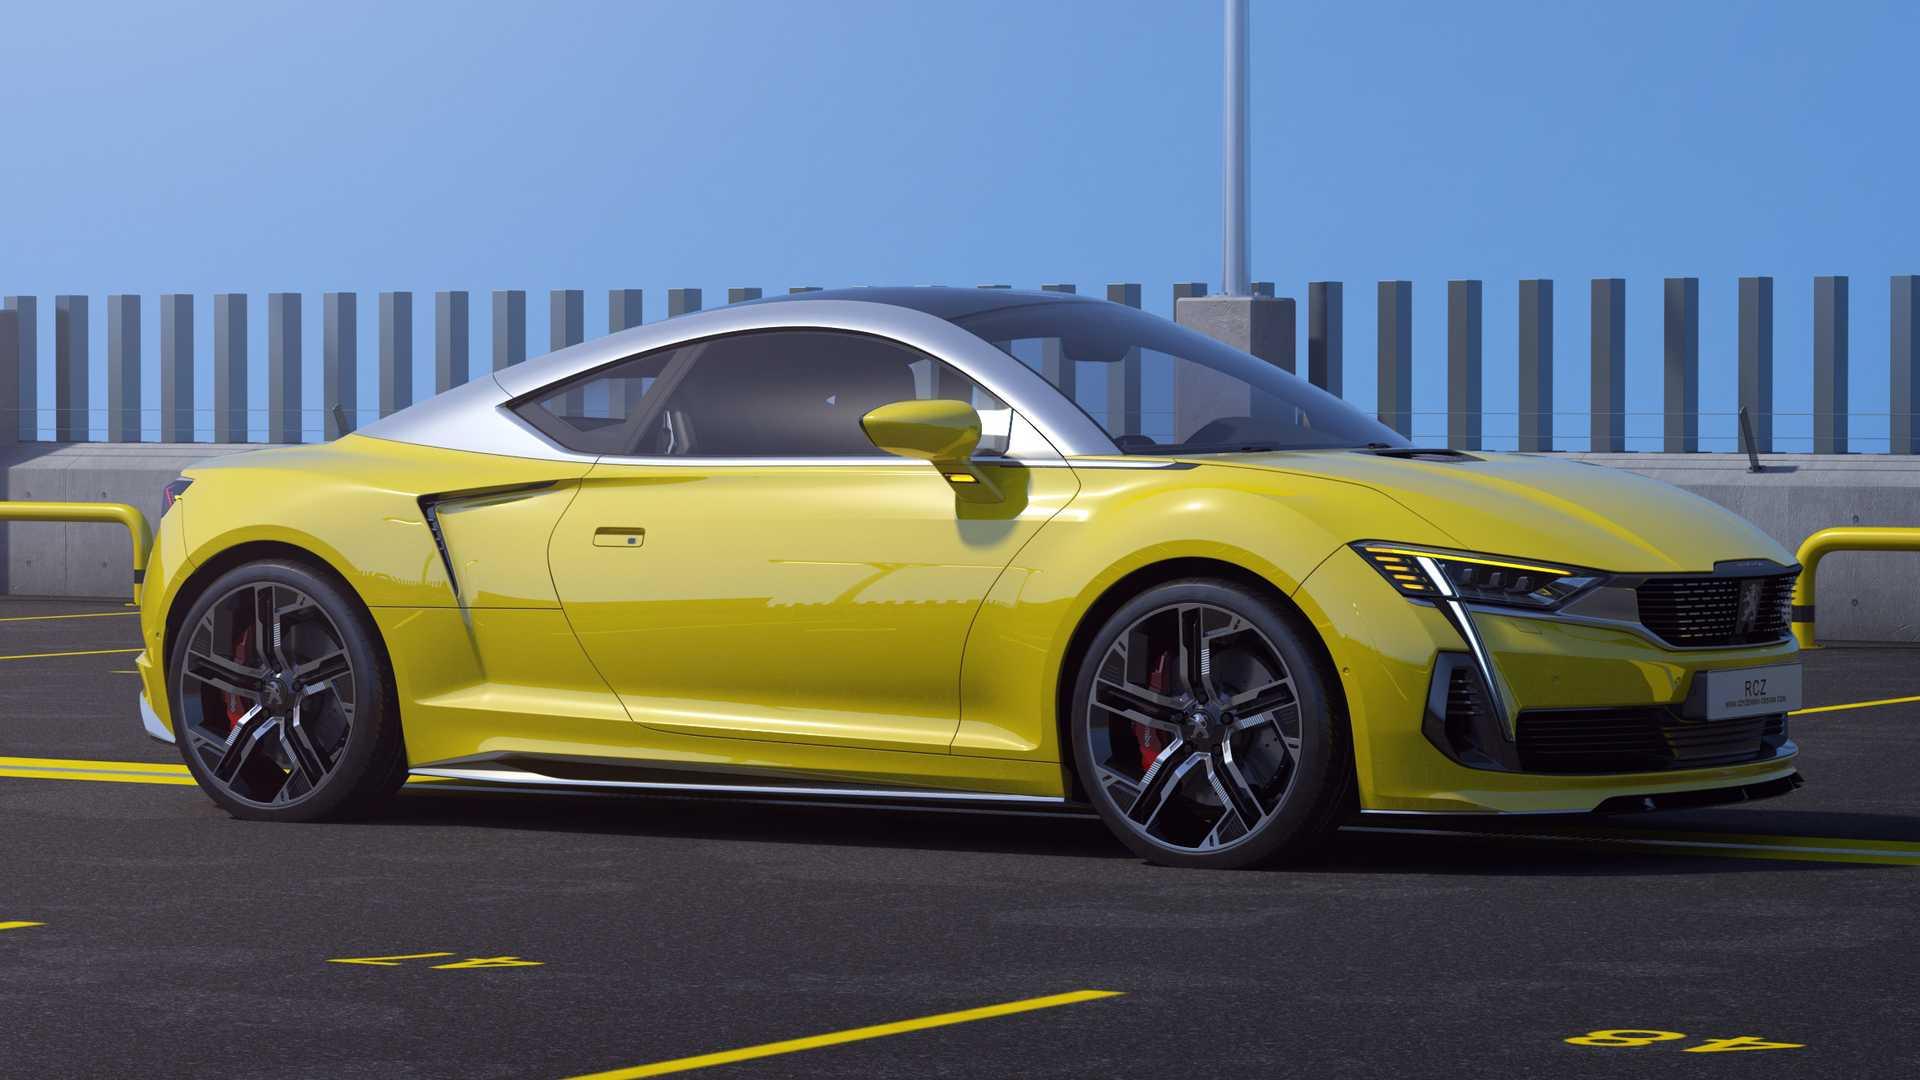 2020_Peugeot_RCZ_rendering_0013